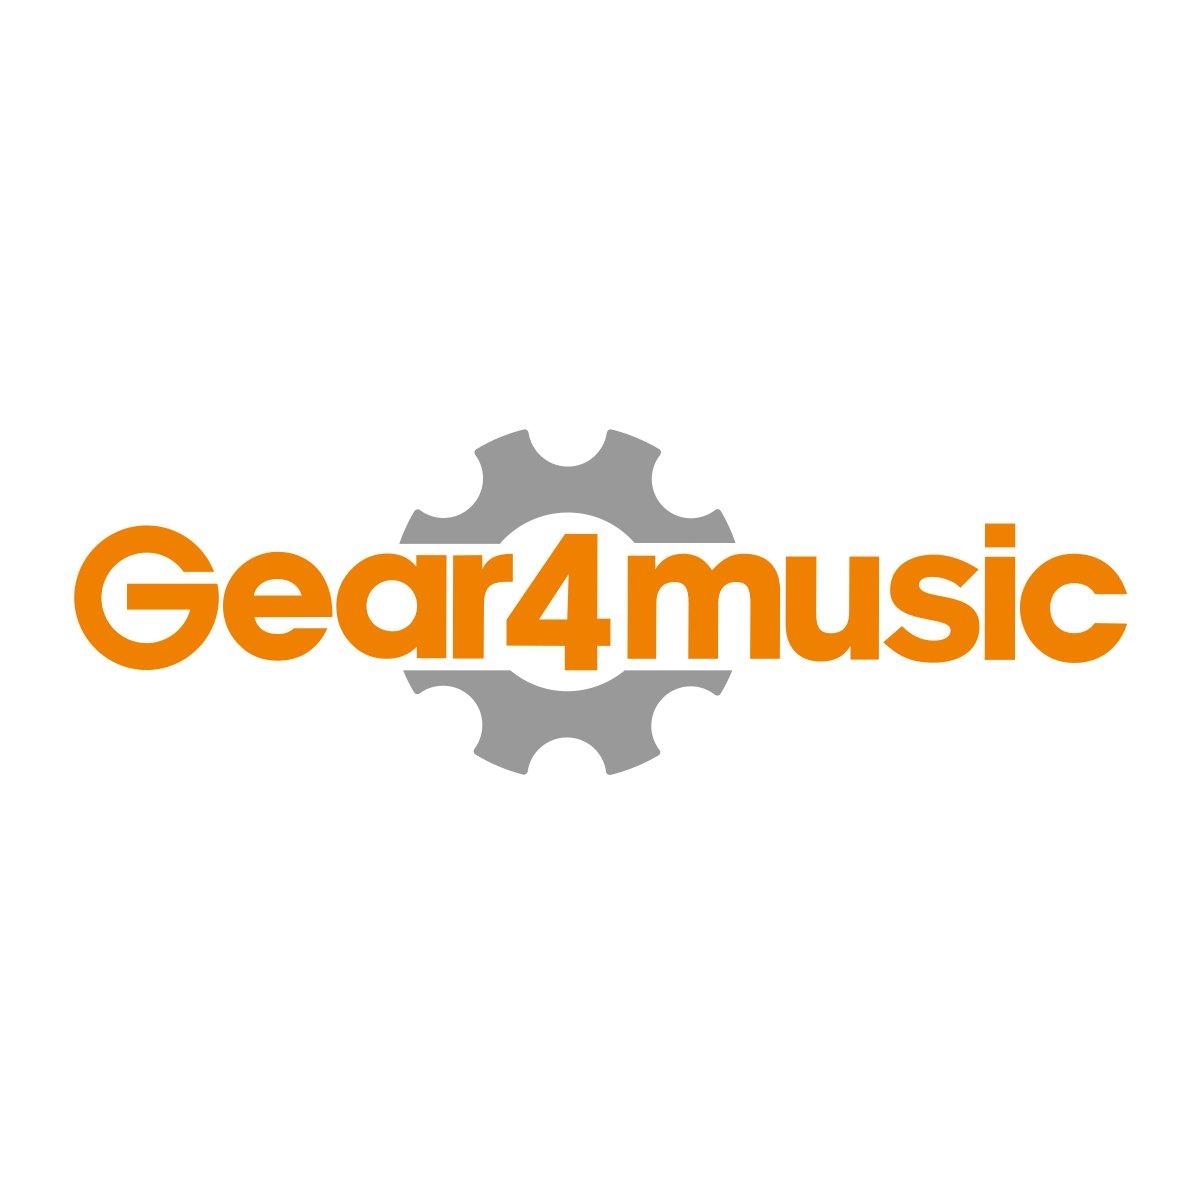 Funda de Caja + Estuche de Baquetas Extraíble de Gear4music